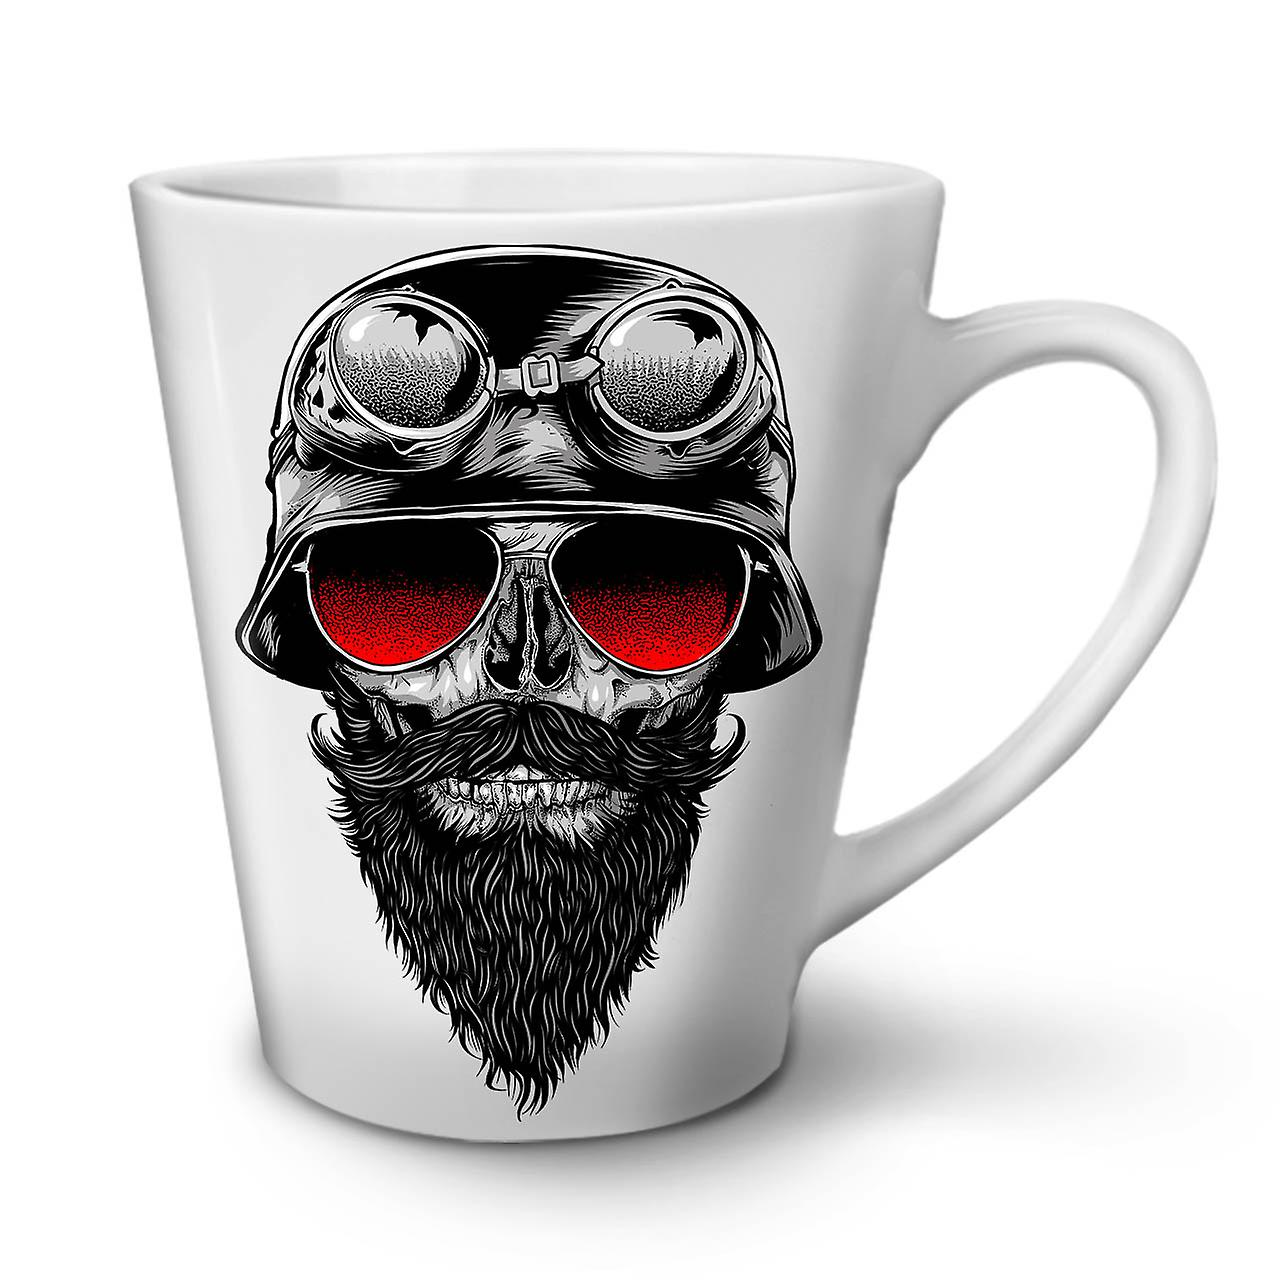 Mug 12 Lunettes Nouveau Blanc OzWellcoda Skull Thé Biker Café Latte En Rouge Céramique Yf6gyb7v